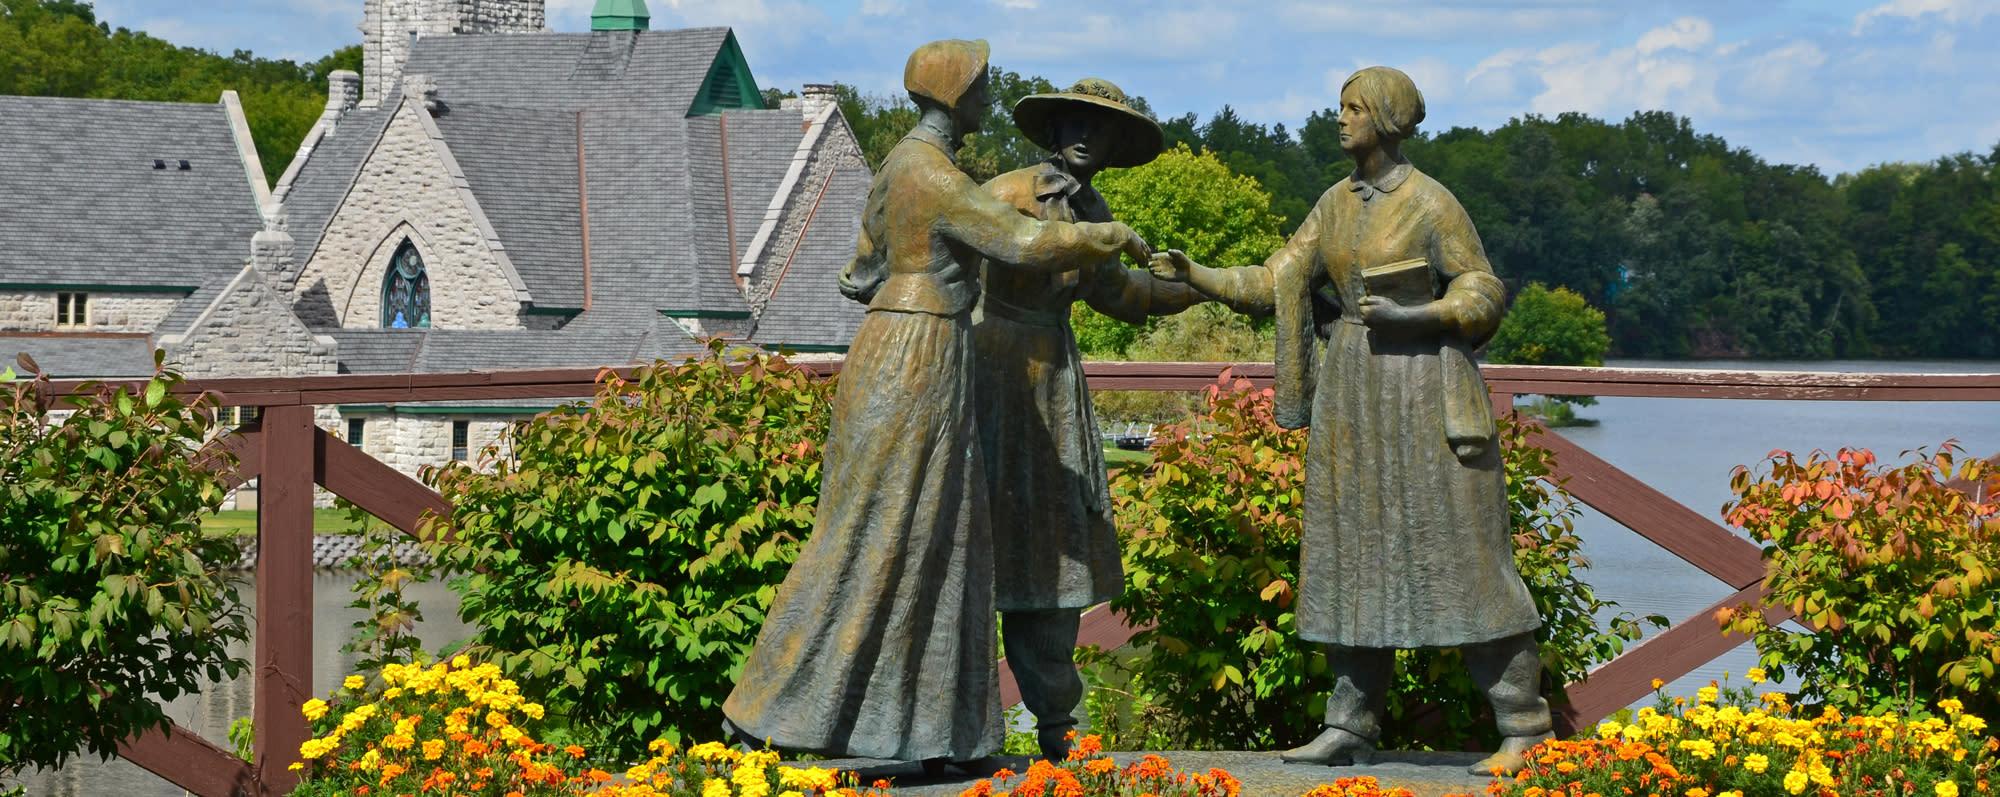 A statue of Susan B. Anthony meeting Elizabeth Cady Stanton in Seneca Falls